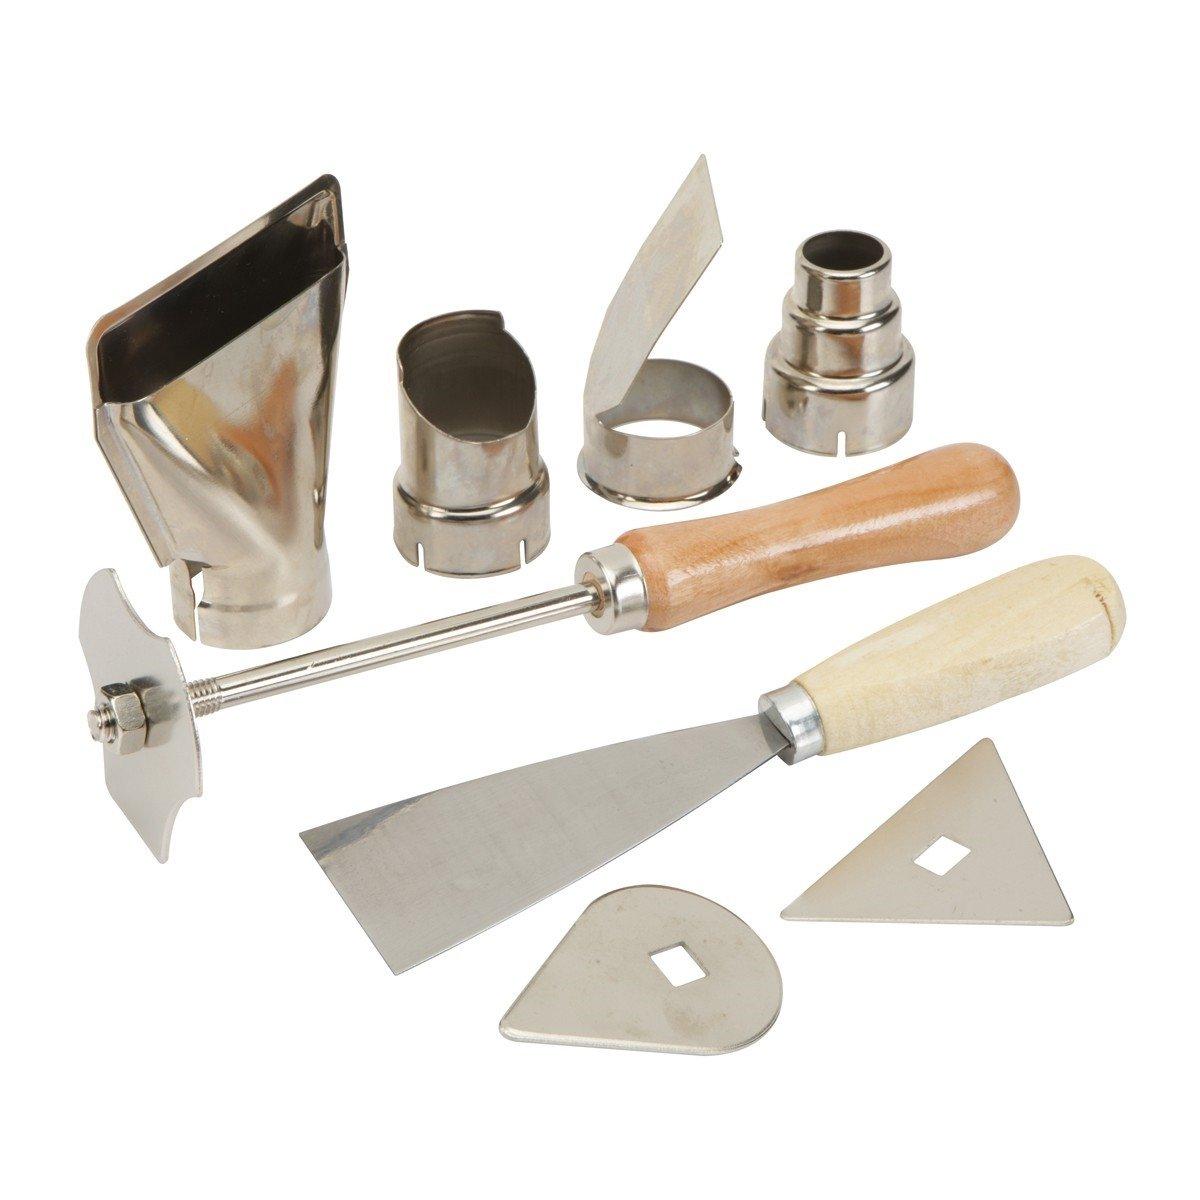 9 Pc Heat Gun Accessory Kit Putty Knife Scraper Spring Steel Head Soldering Welding Works Tools